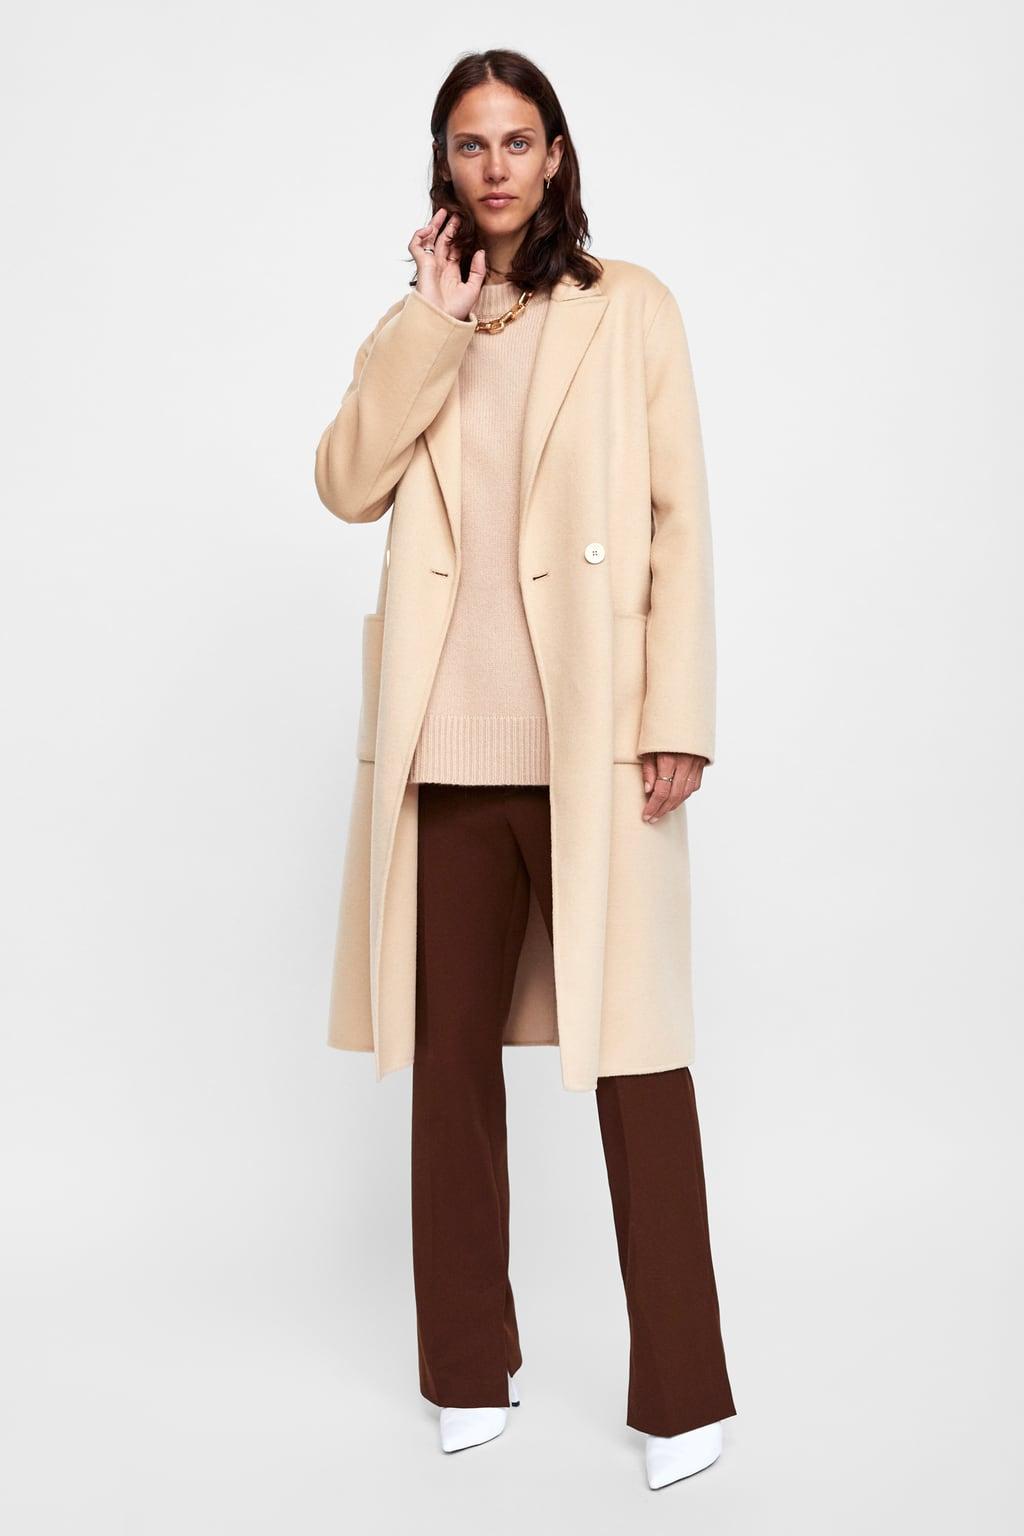 winter fashion ireland zara